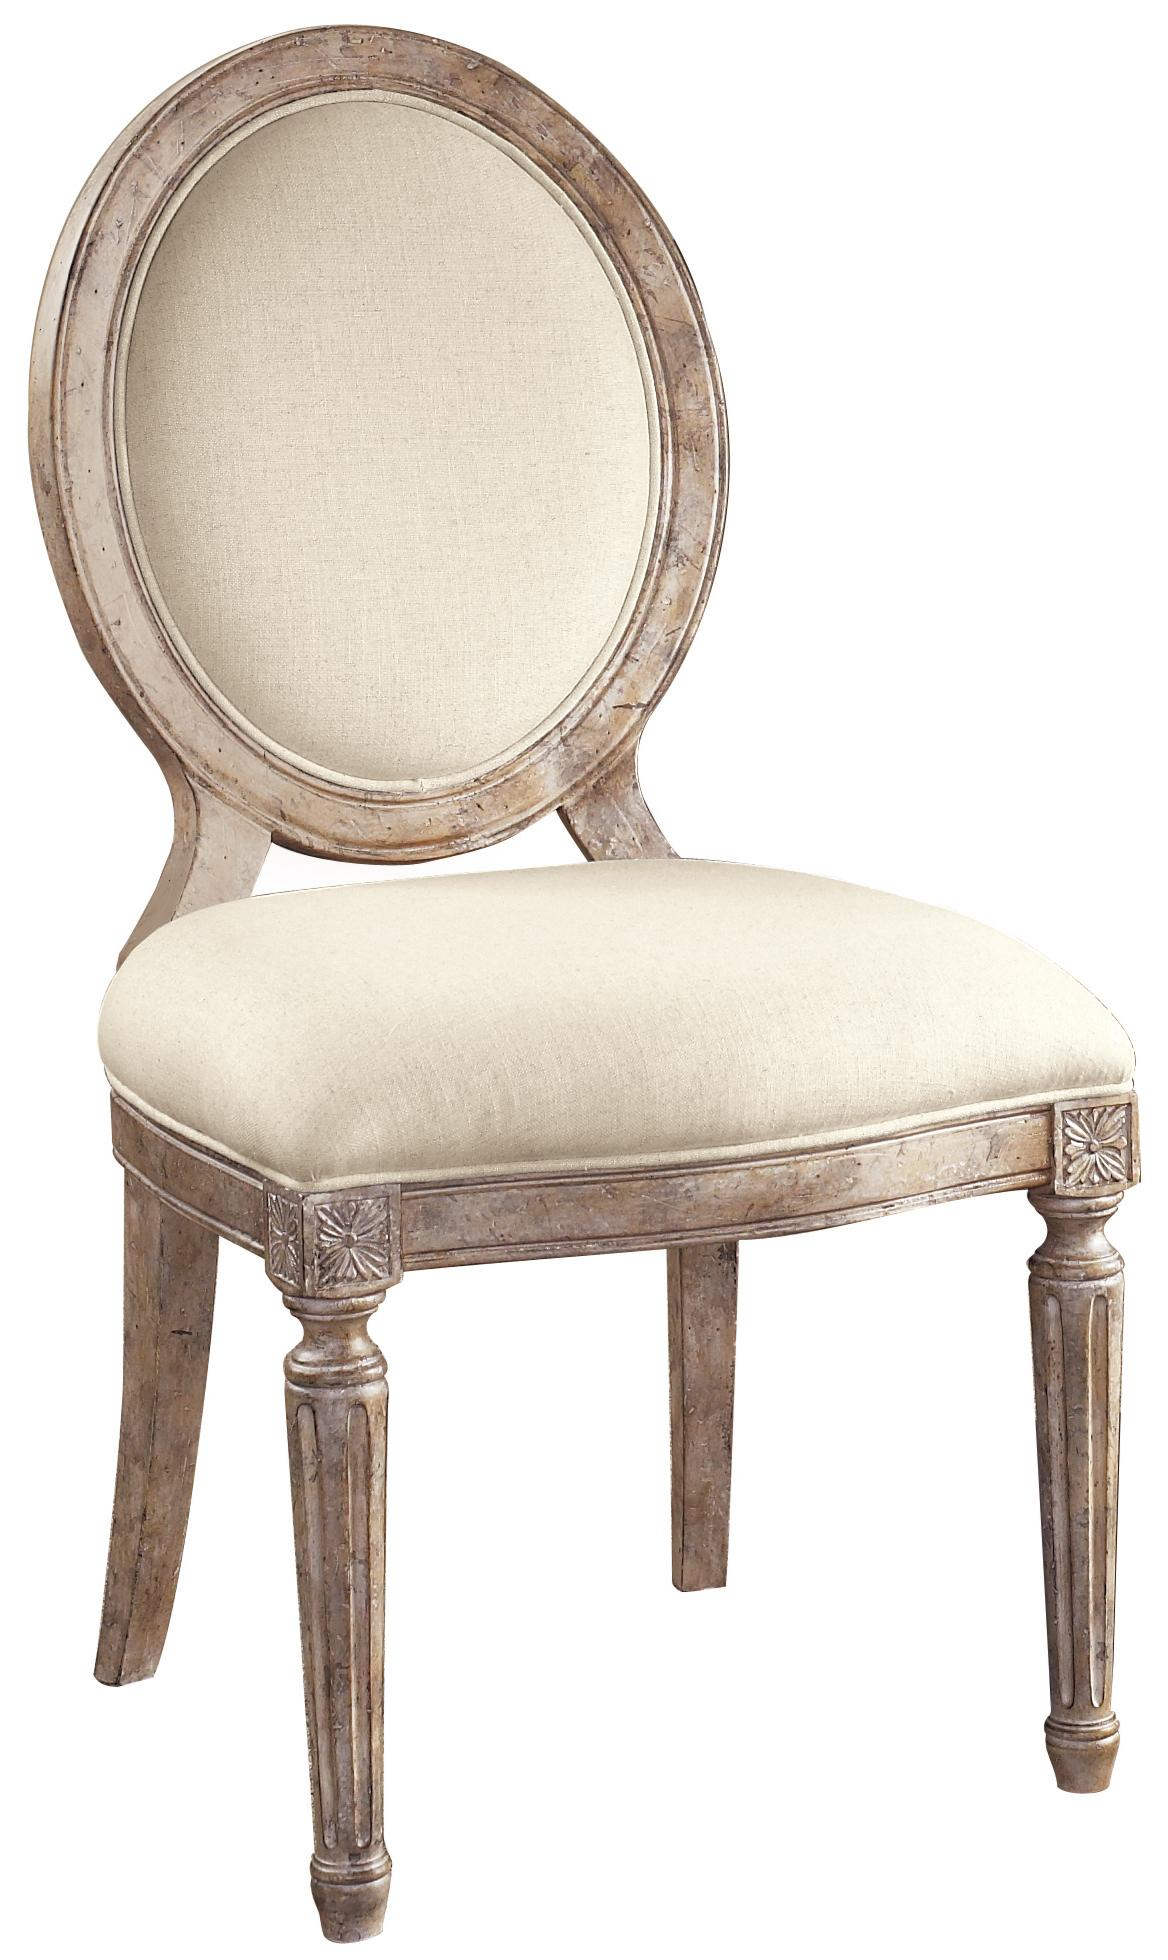 Pulaski Furniture Accentrics Home Anthousa Side Chair - Item Number: 205005